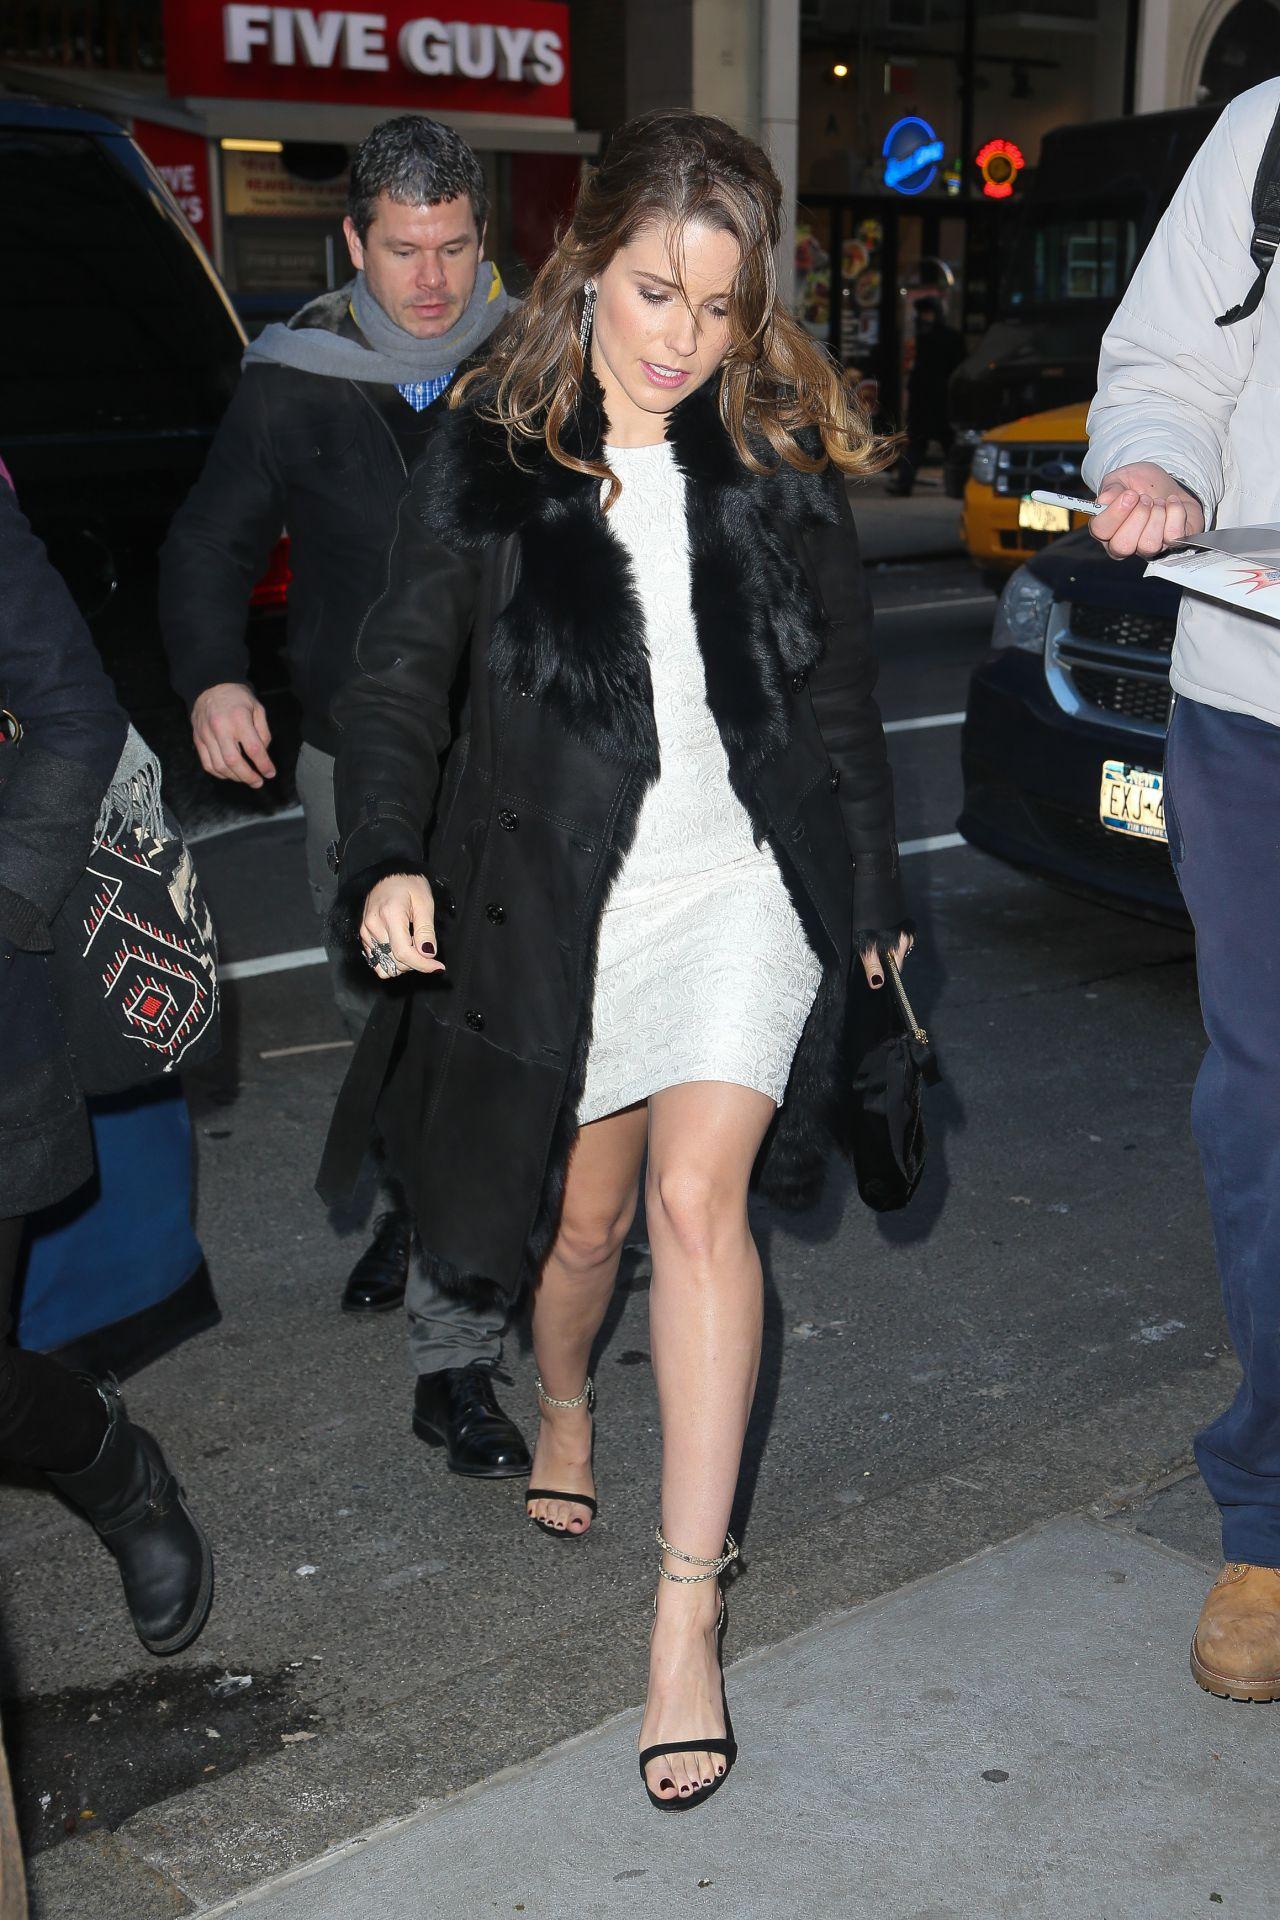 Inside Critics' Choice Awards with Jennifer Aniston and Angelina Jolie